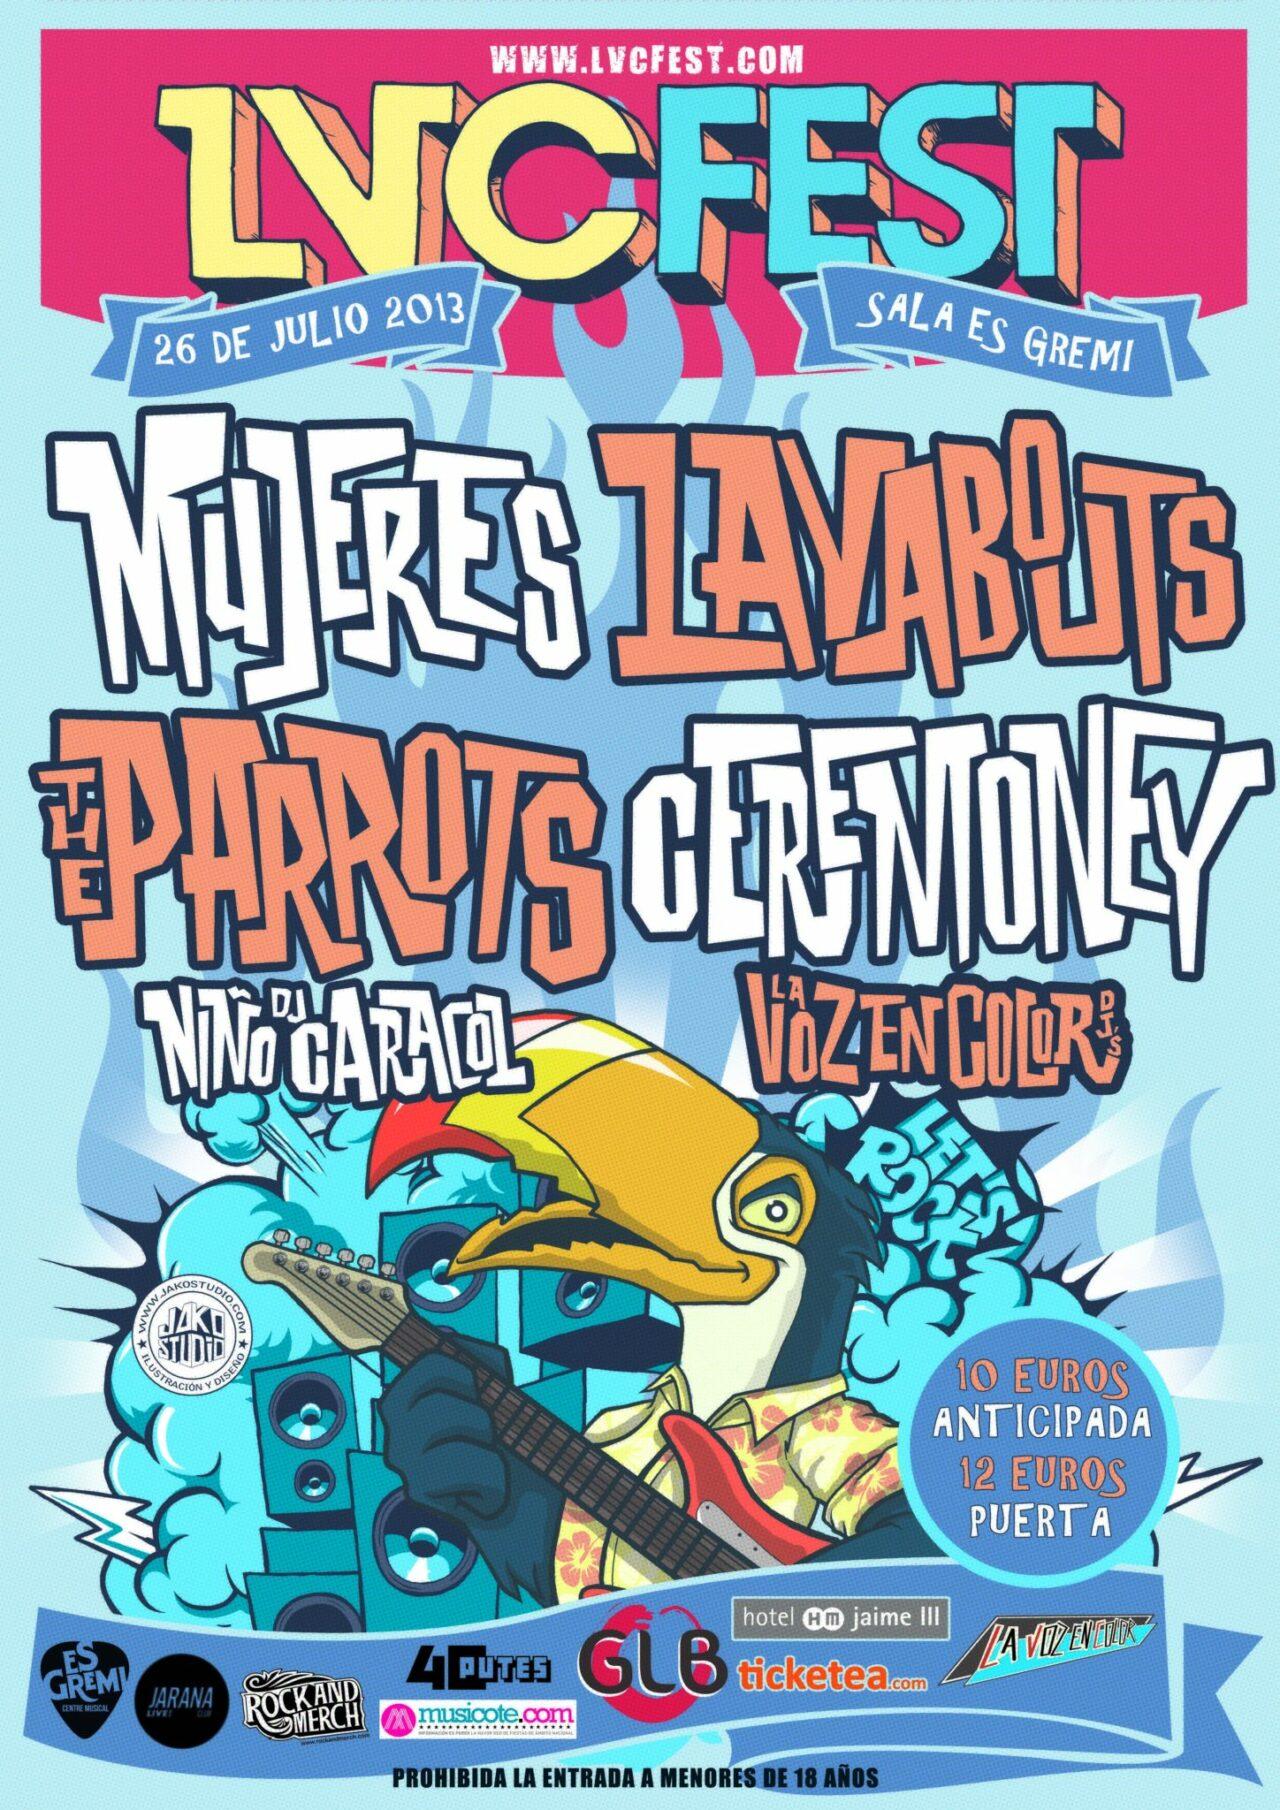 Horarios y Teaser del LVC Fest